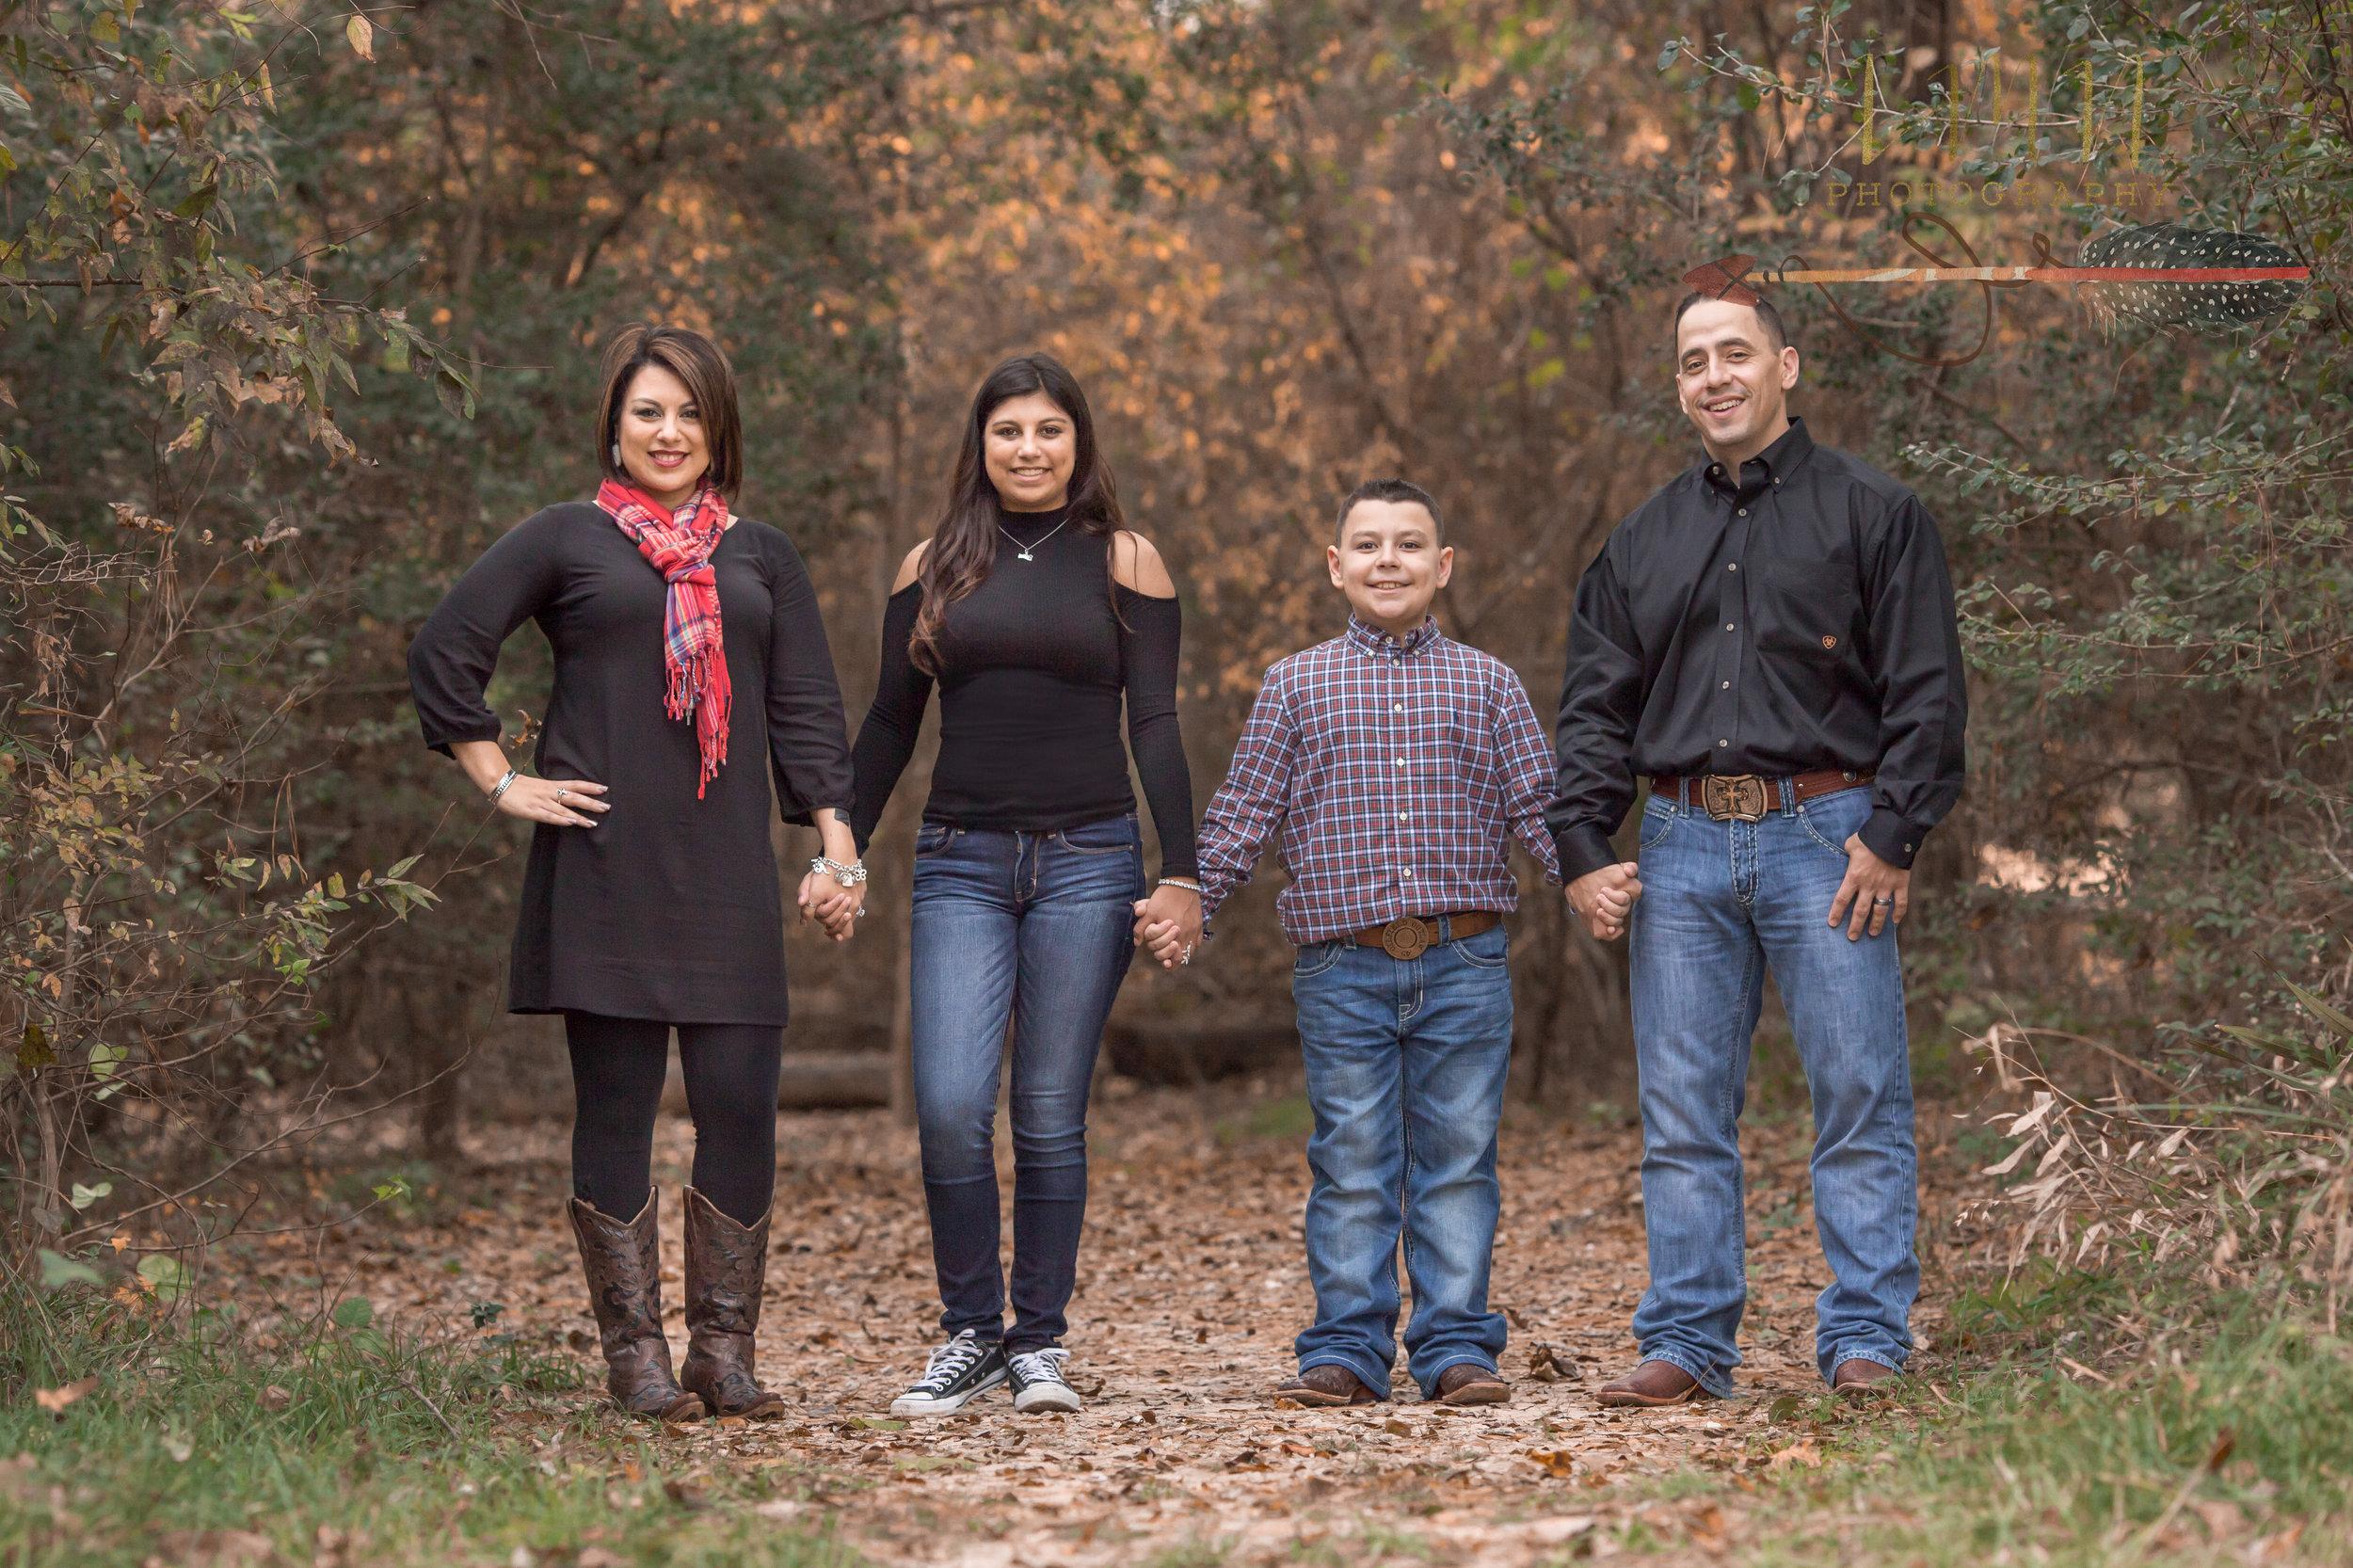 Cypress TX Family Photographer 77433 77429